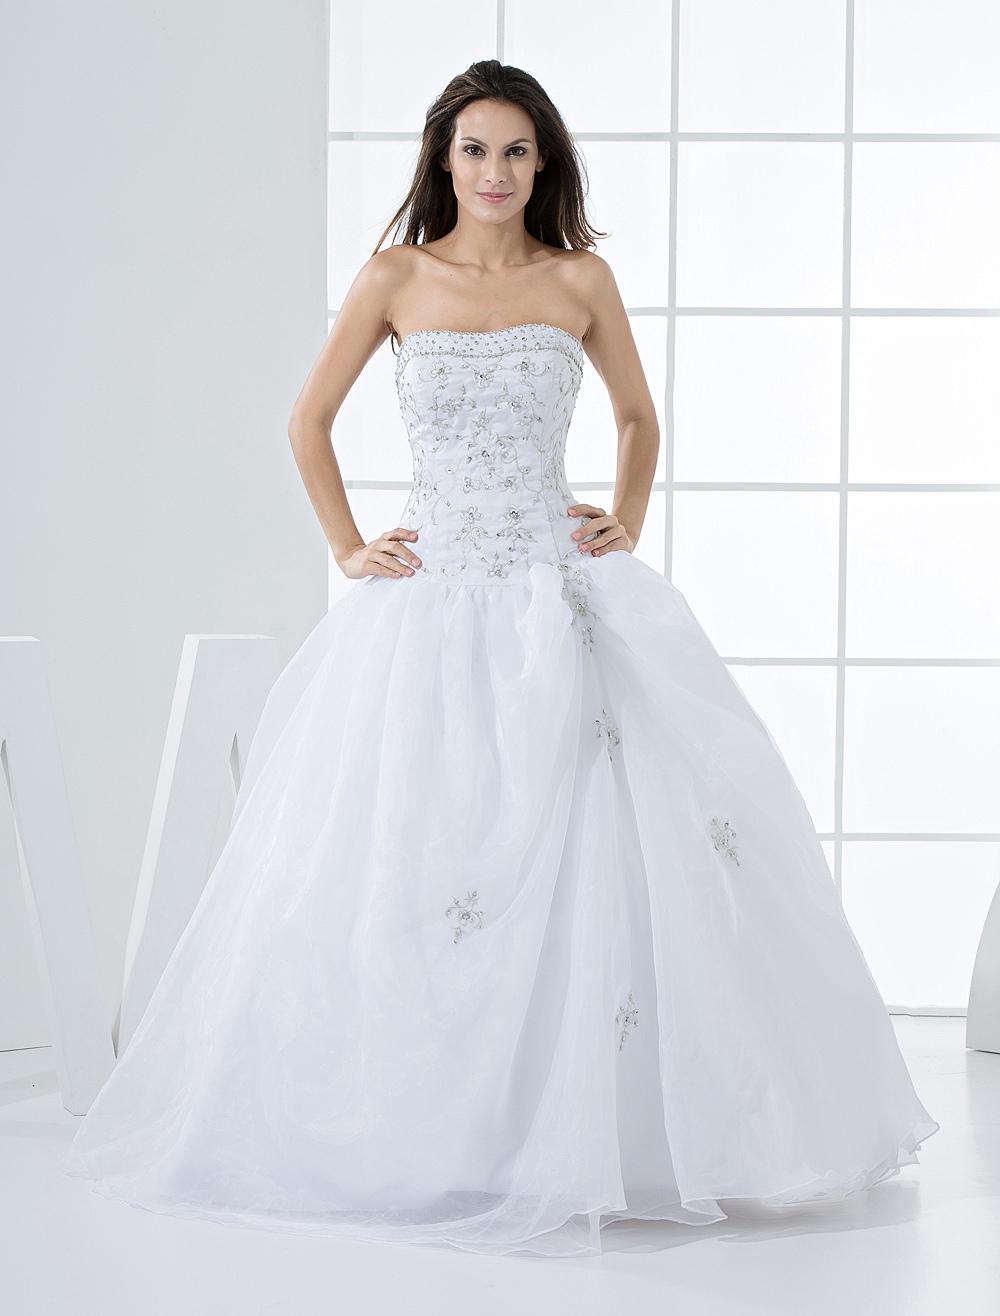 Elegant Ball Gown White Quinceanera Dress - Milanoo.com